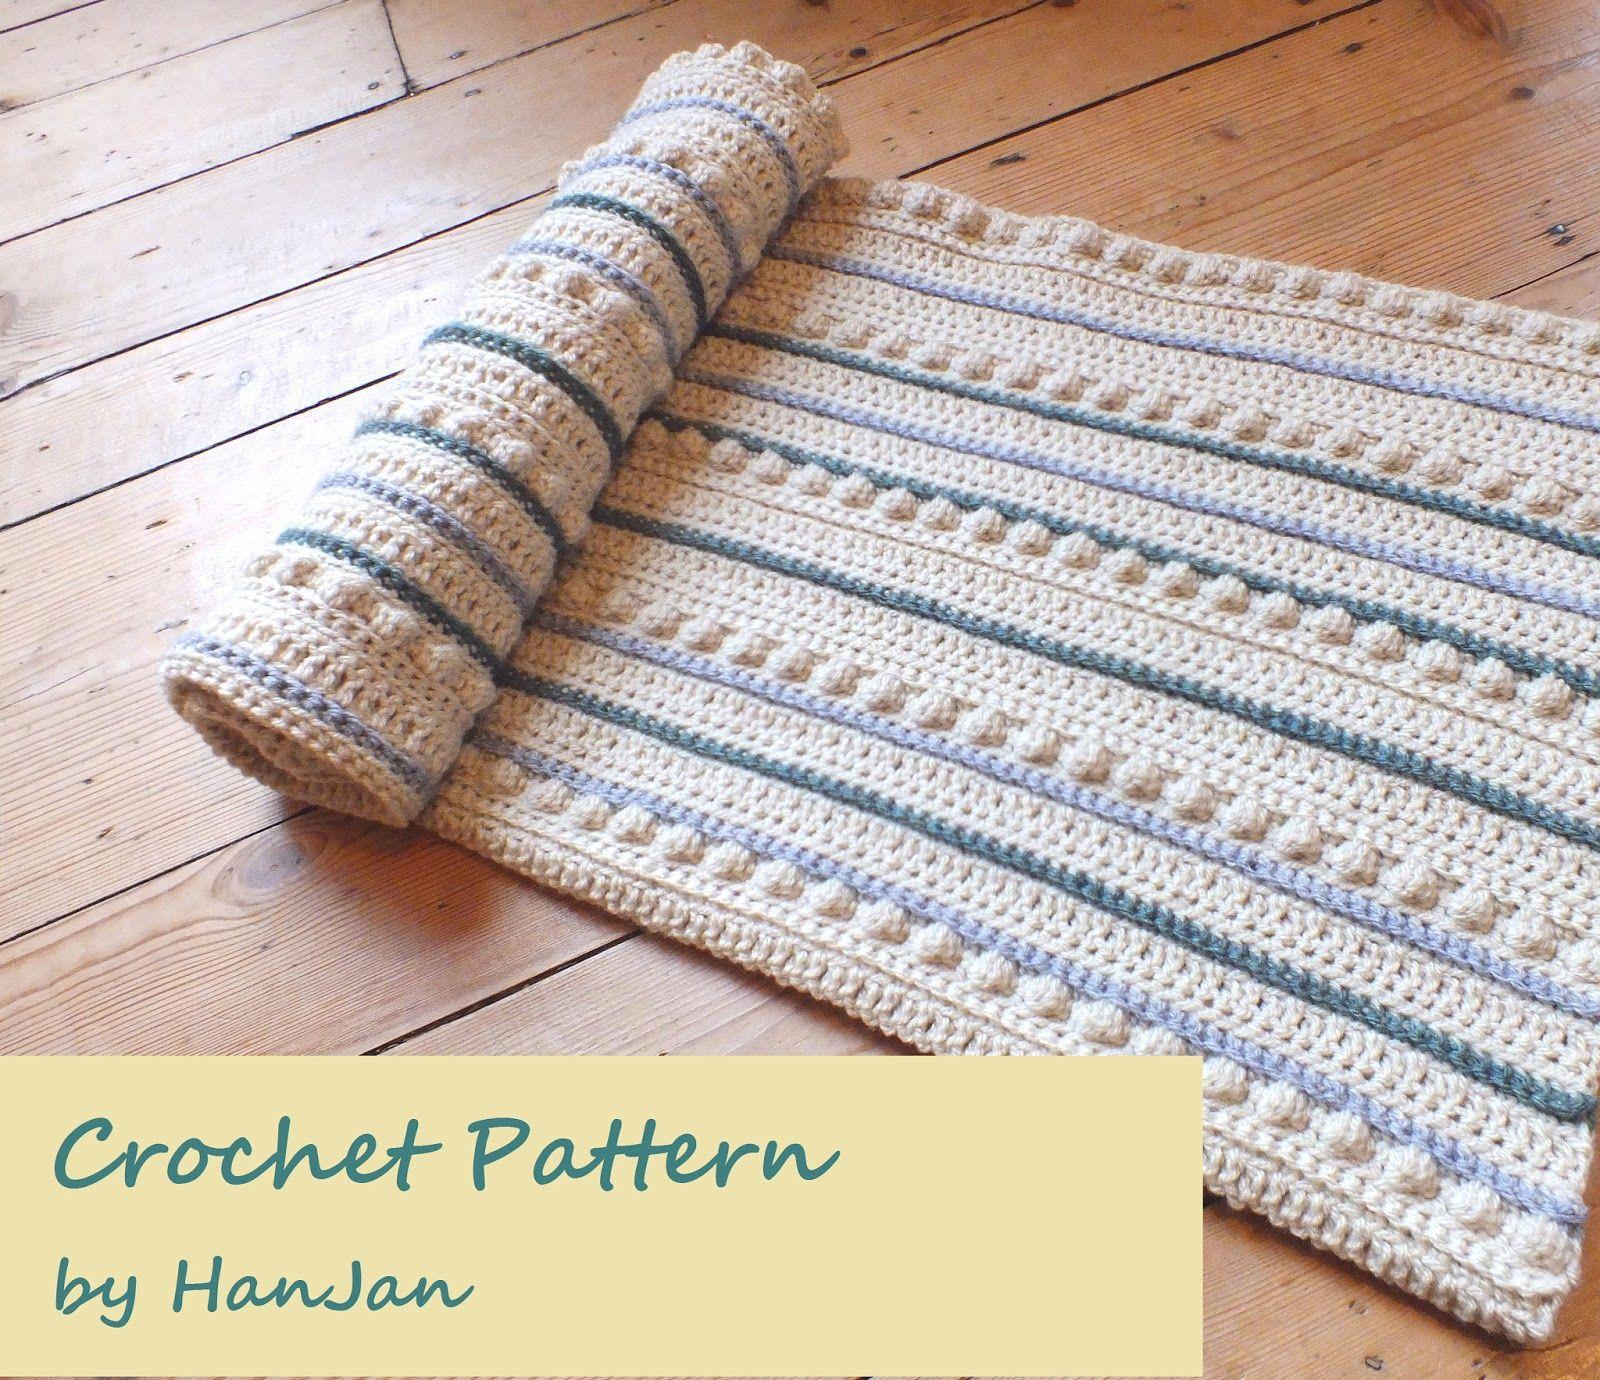 Hanjancrafts rustic bobble blanket new crochet pattern from hanjancrafts rustic bobble blanket new crochet pattern from hanjan bankloansurffo Choice Image